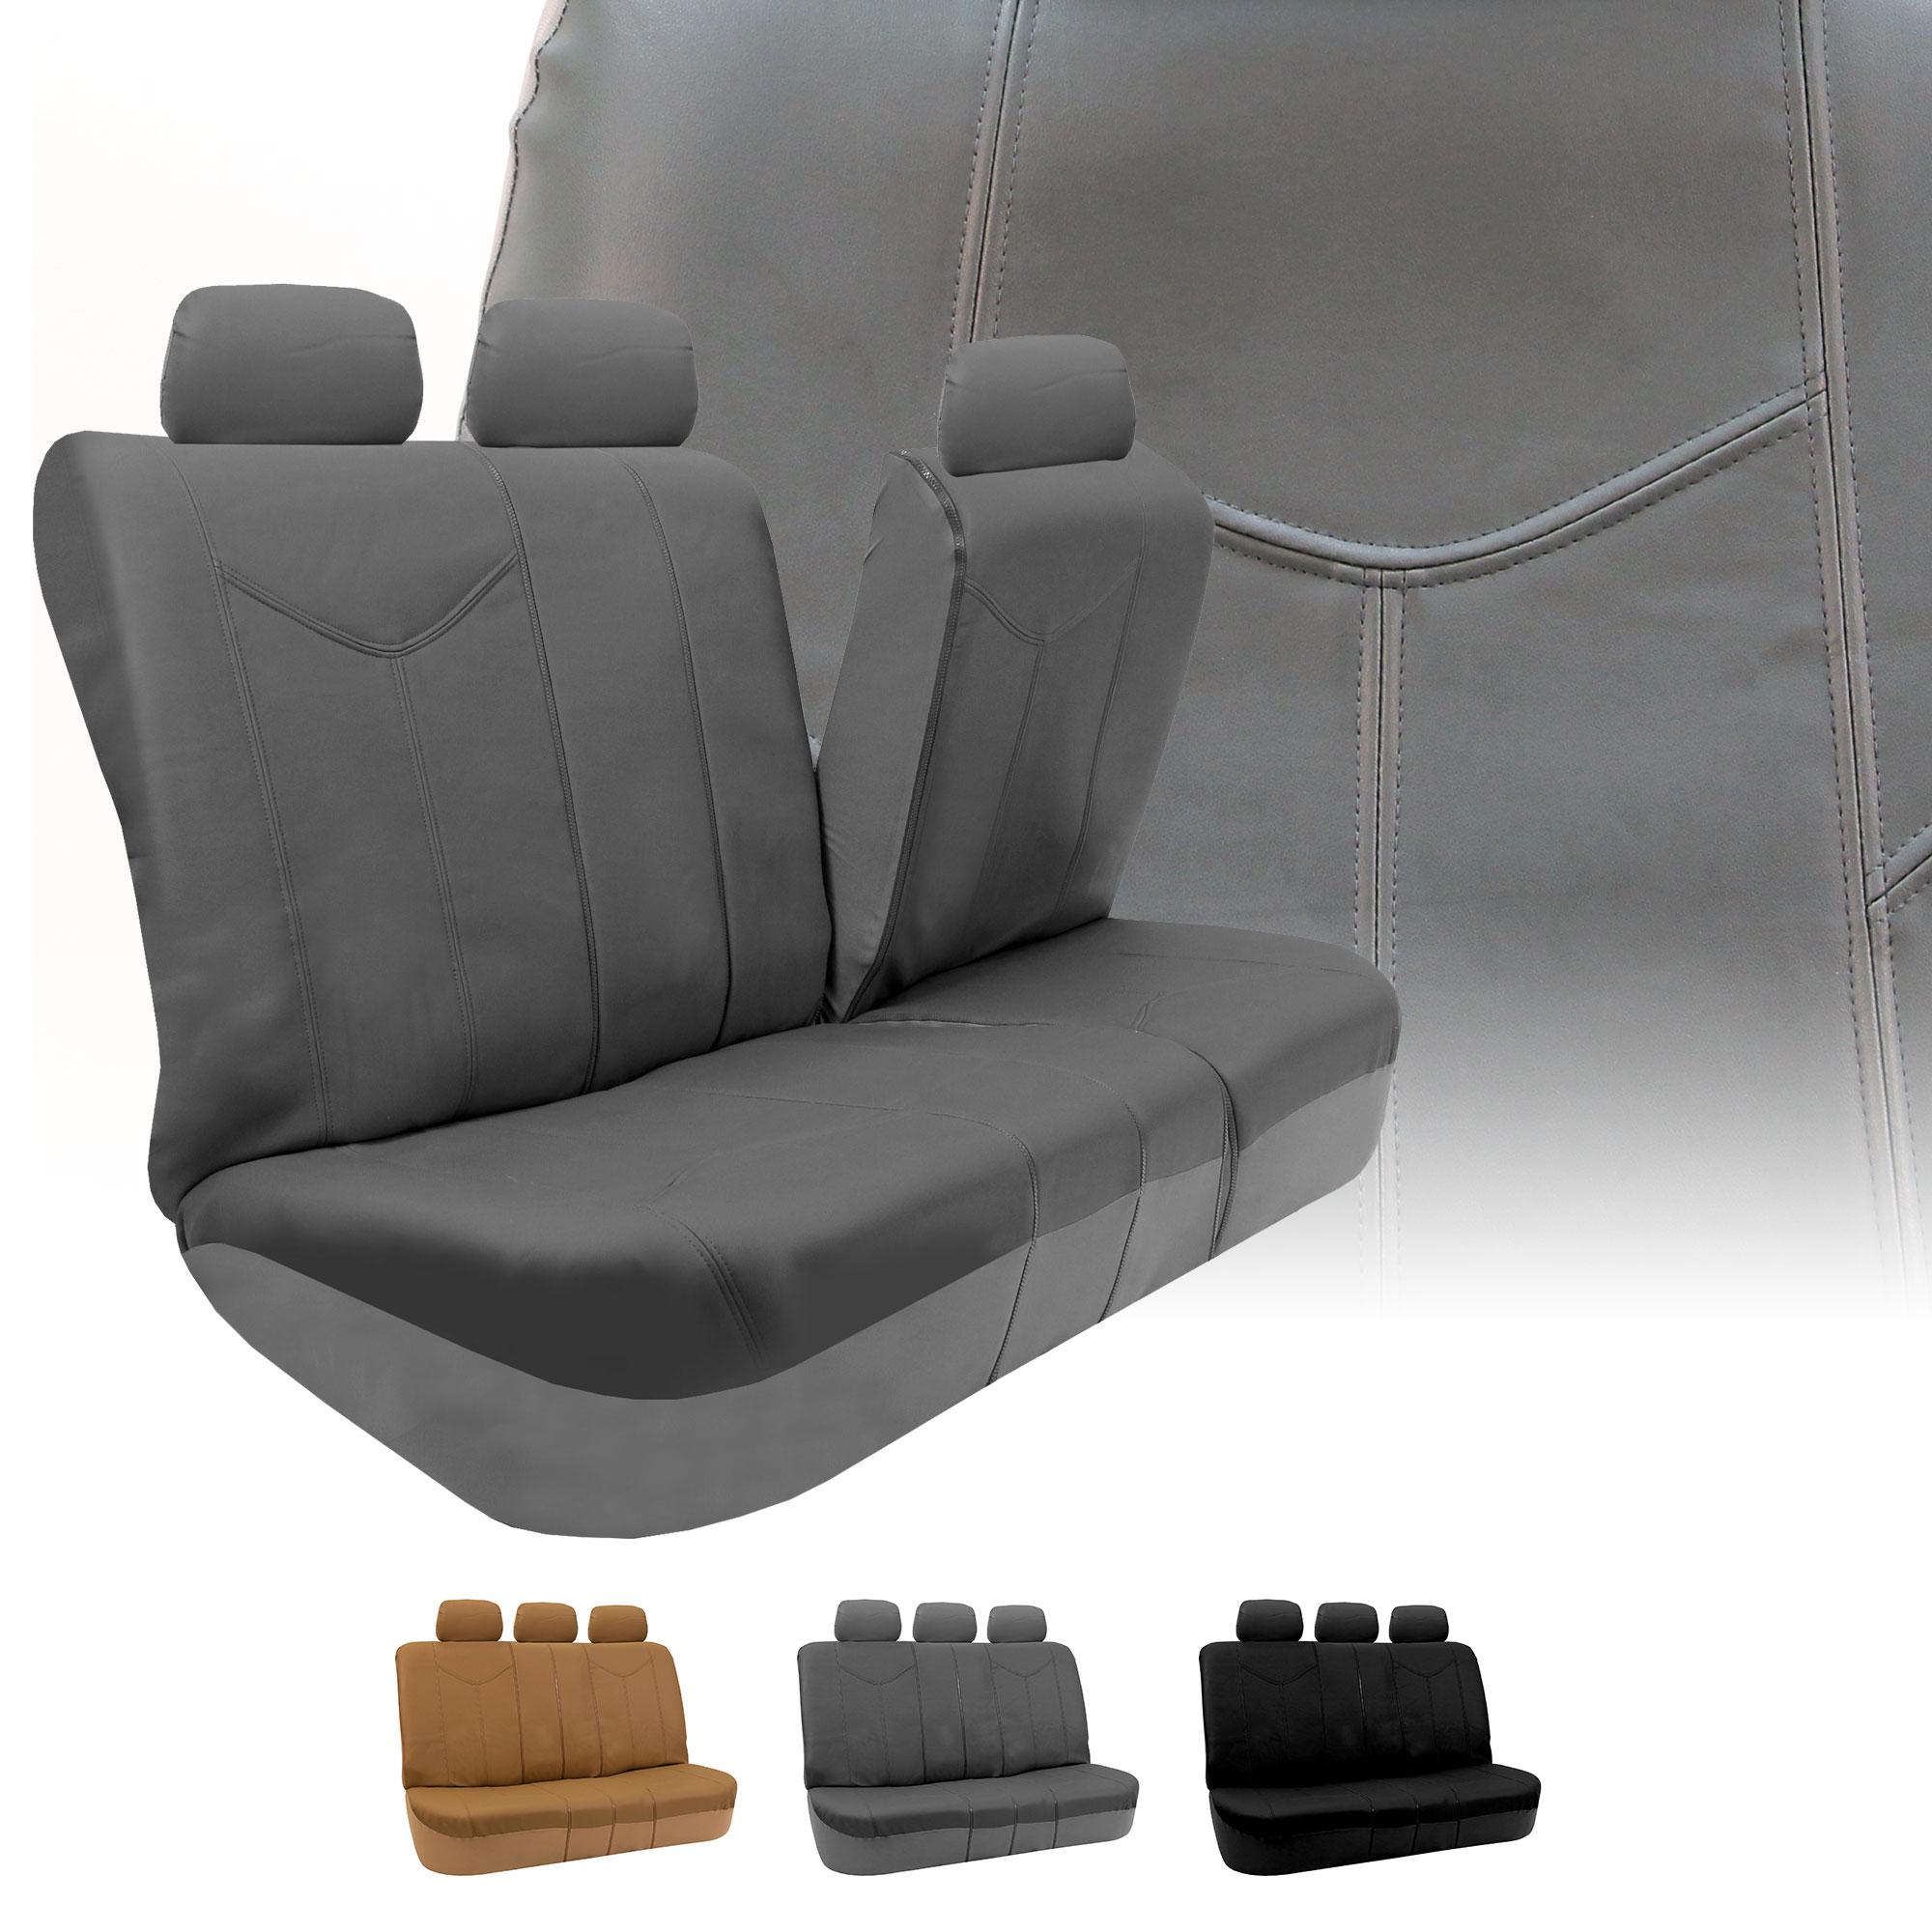 Rome Pu Leather Car Seat Covers Full Set Air Bag Safe